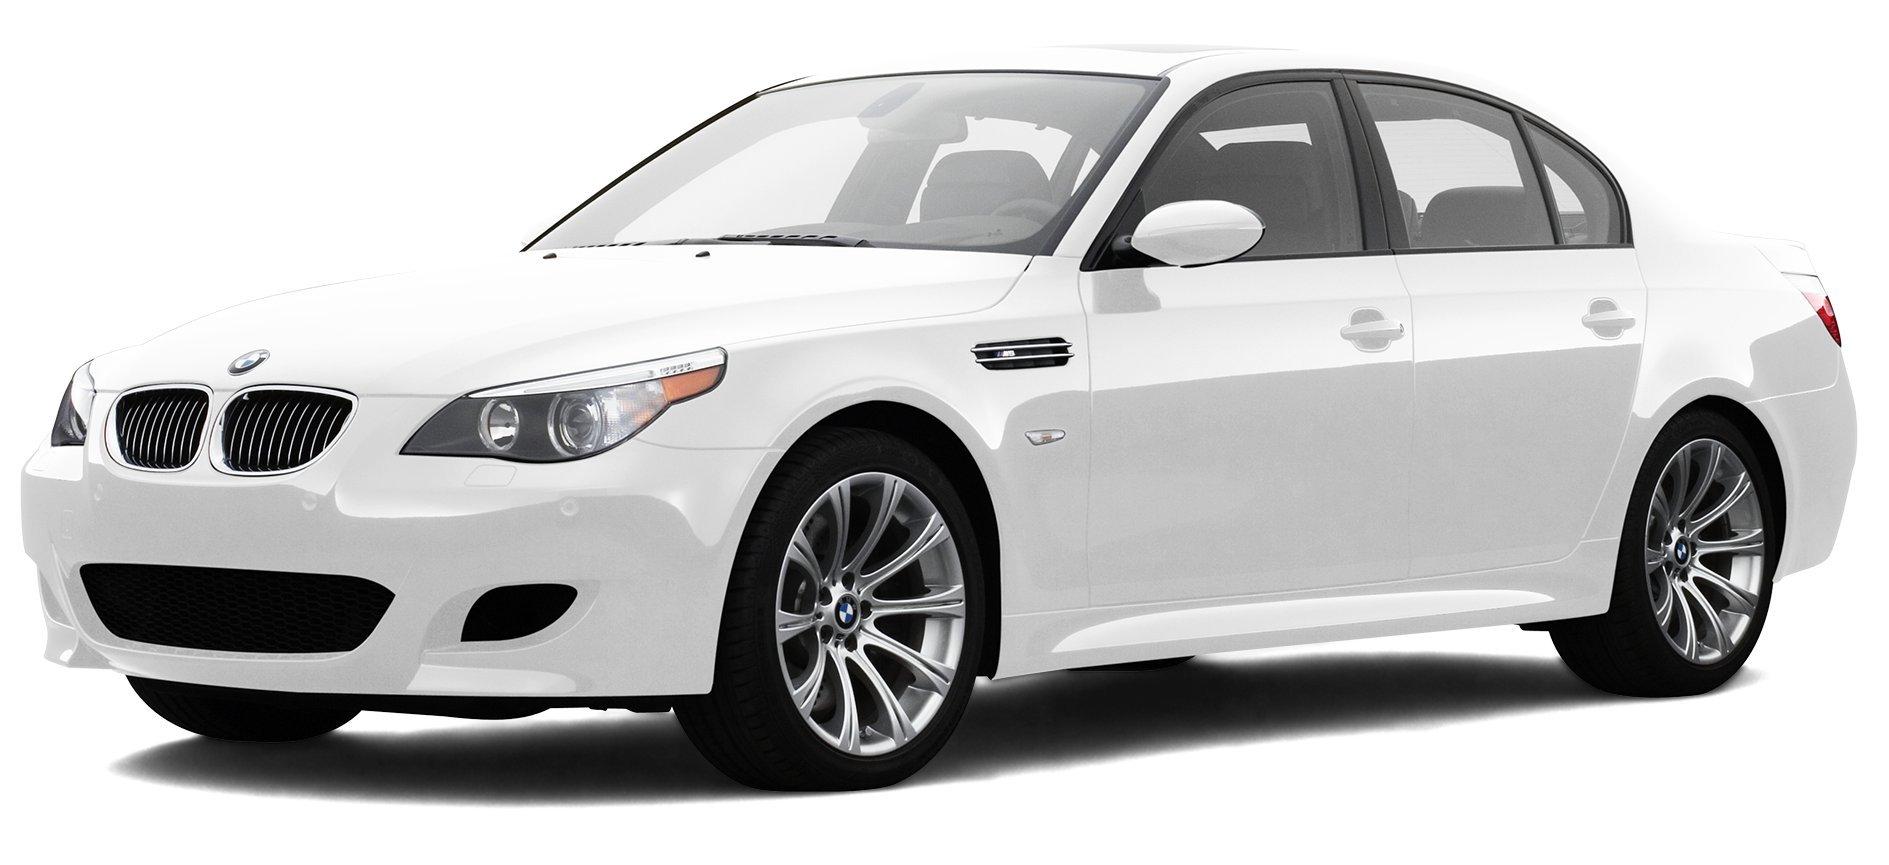 Amazoncom BMW Li Reviews Images And Specs Vehicles - 2007 bmw 750il